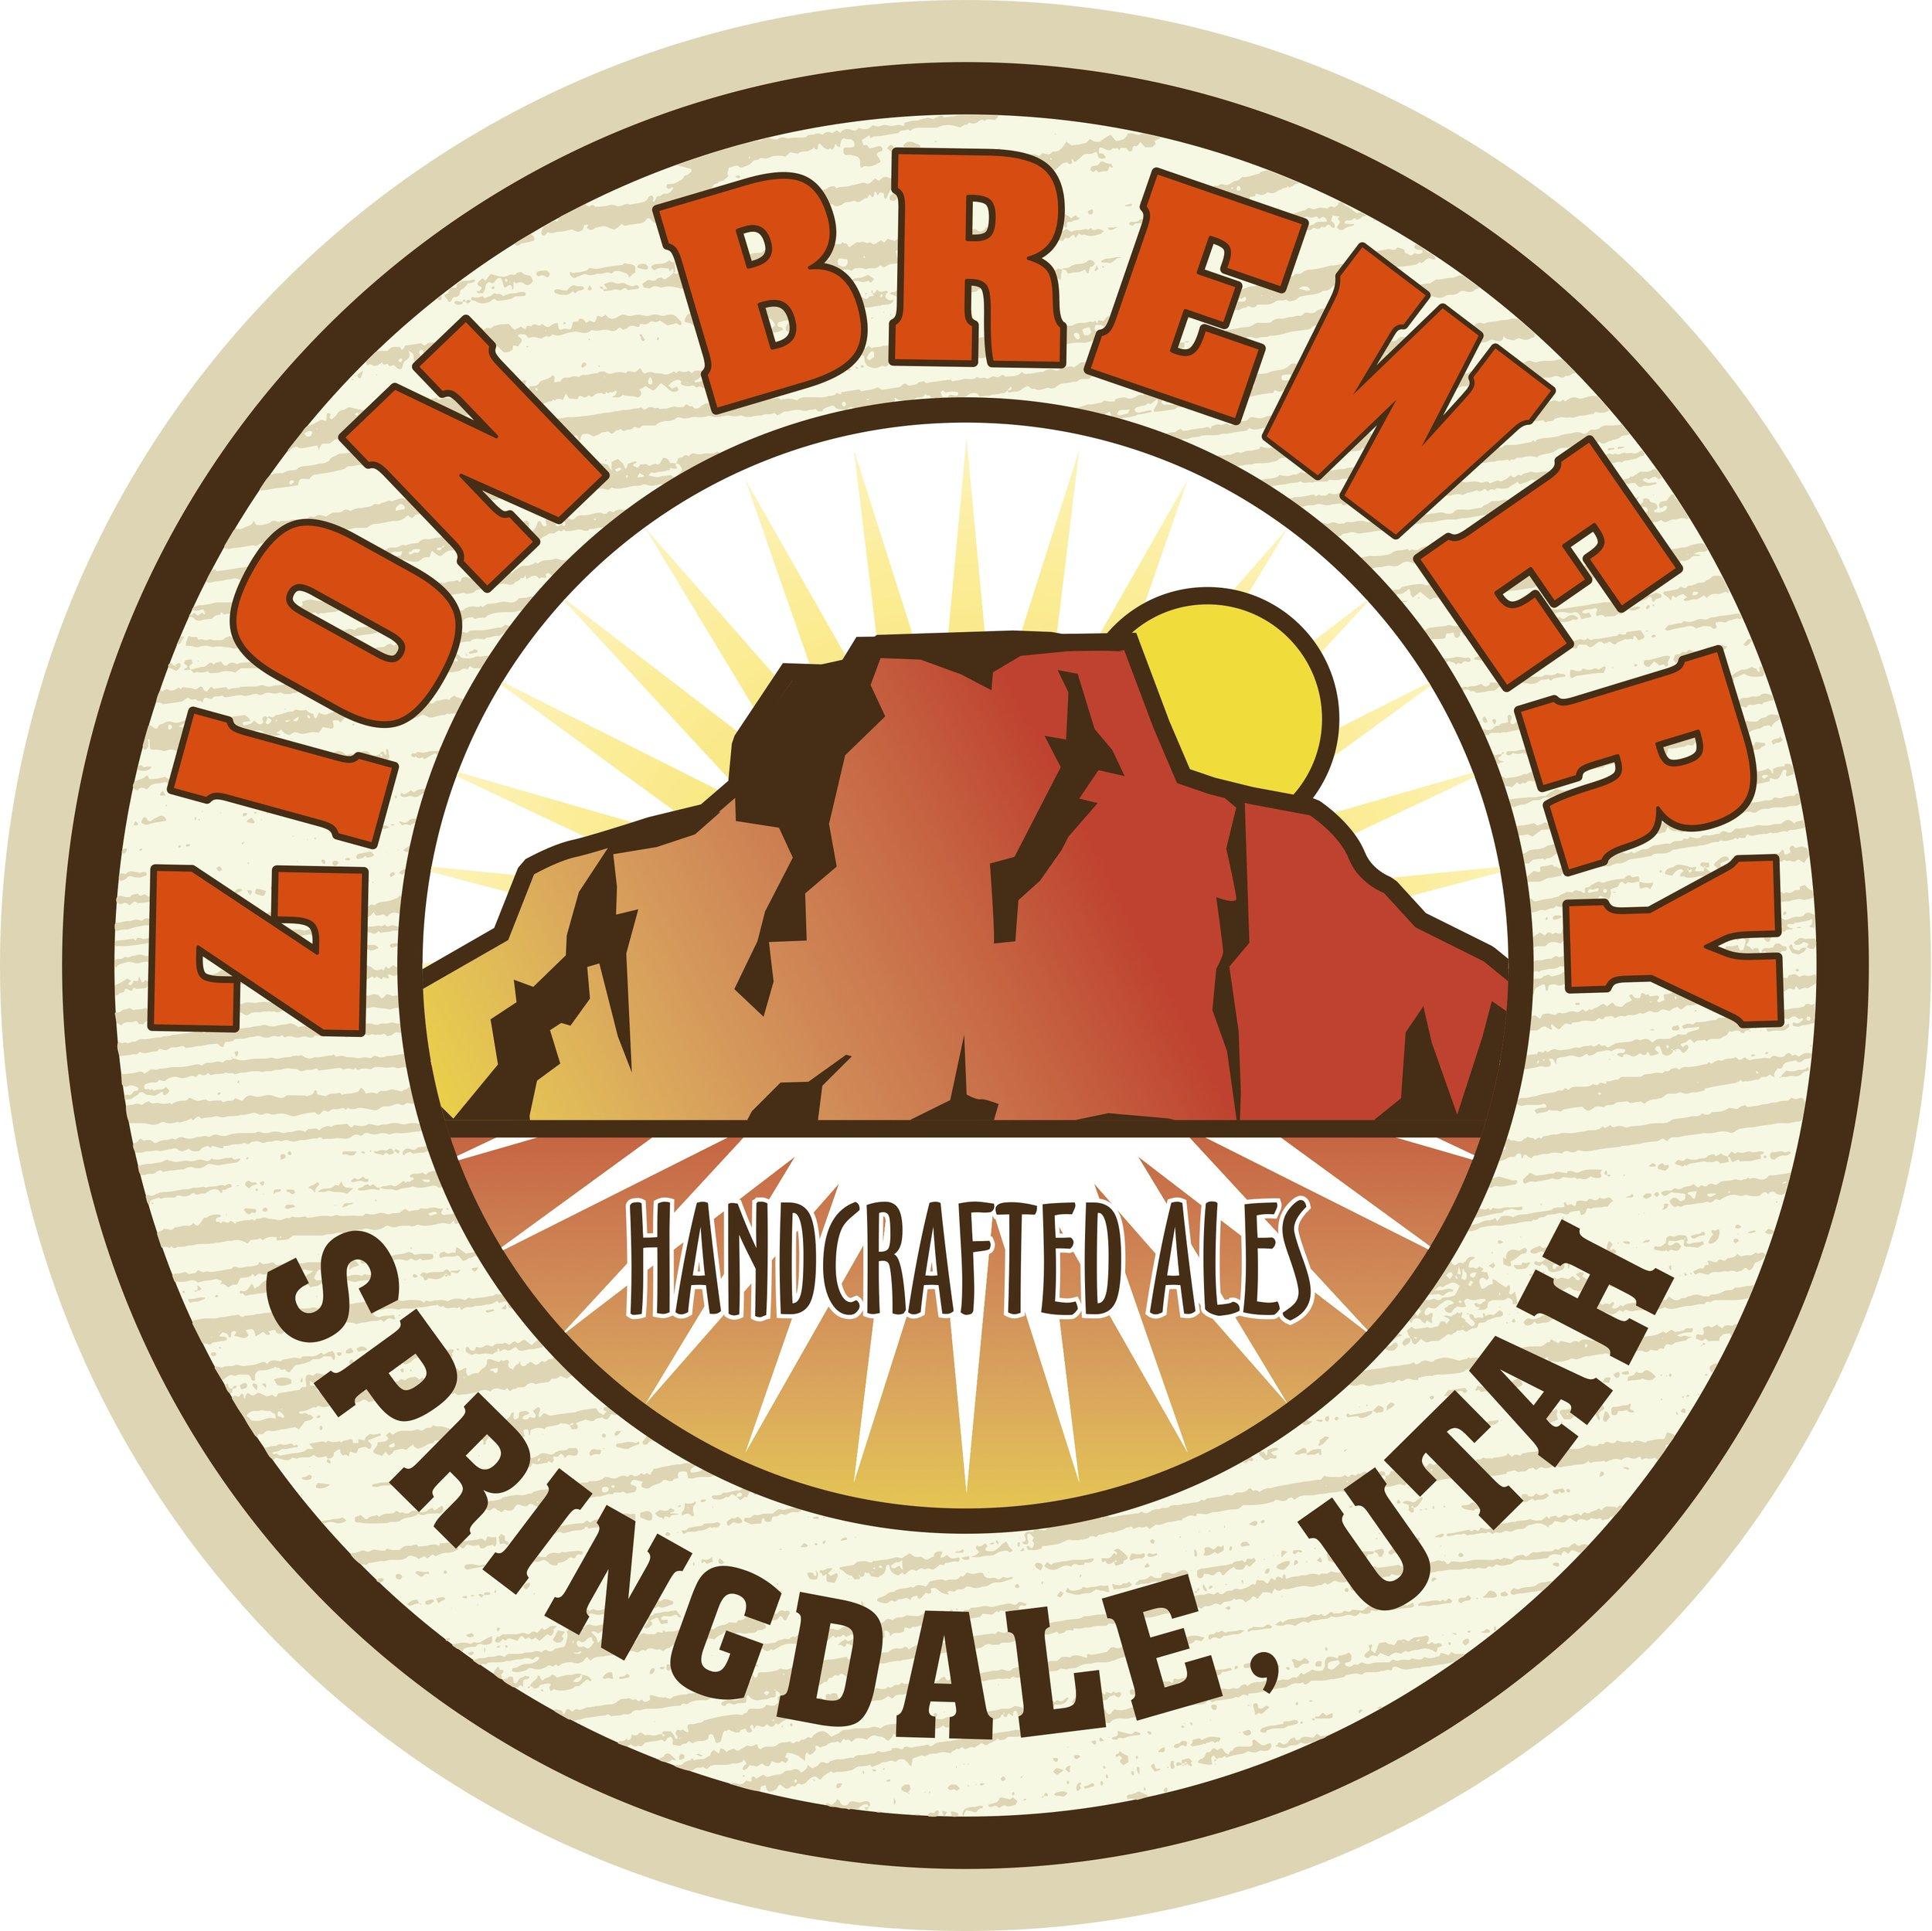 zion canyon brewing logo.jpg